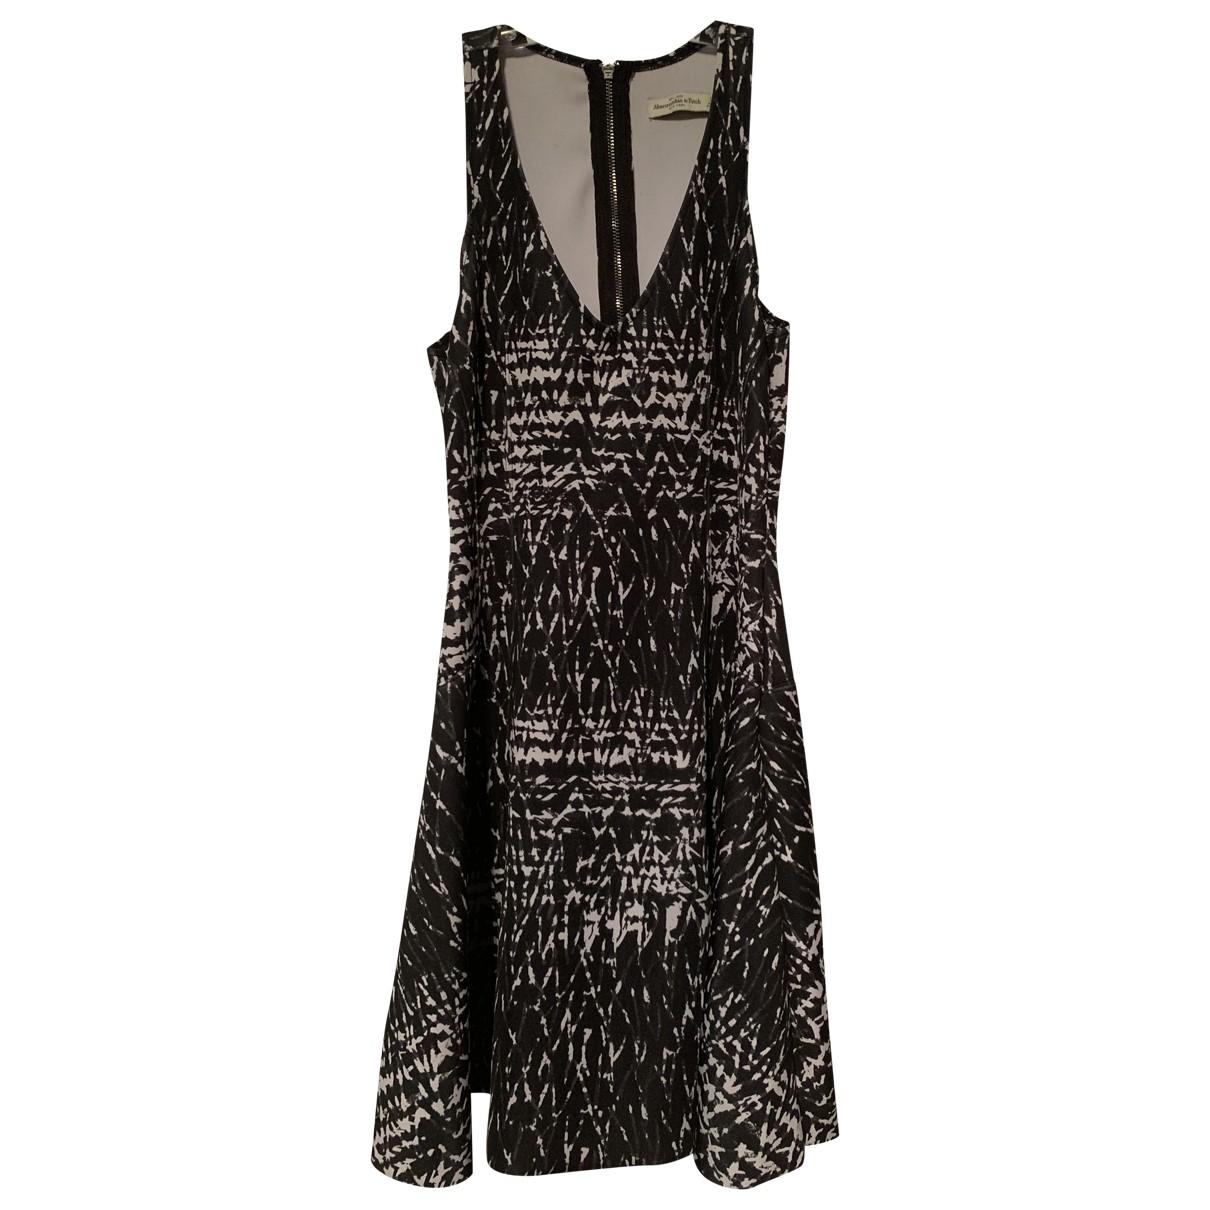 Abercrombie & Fitch \N Multicolour dress for Women S International